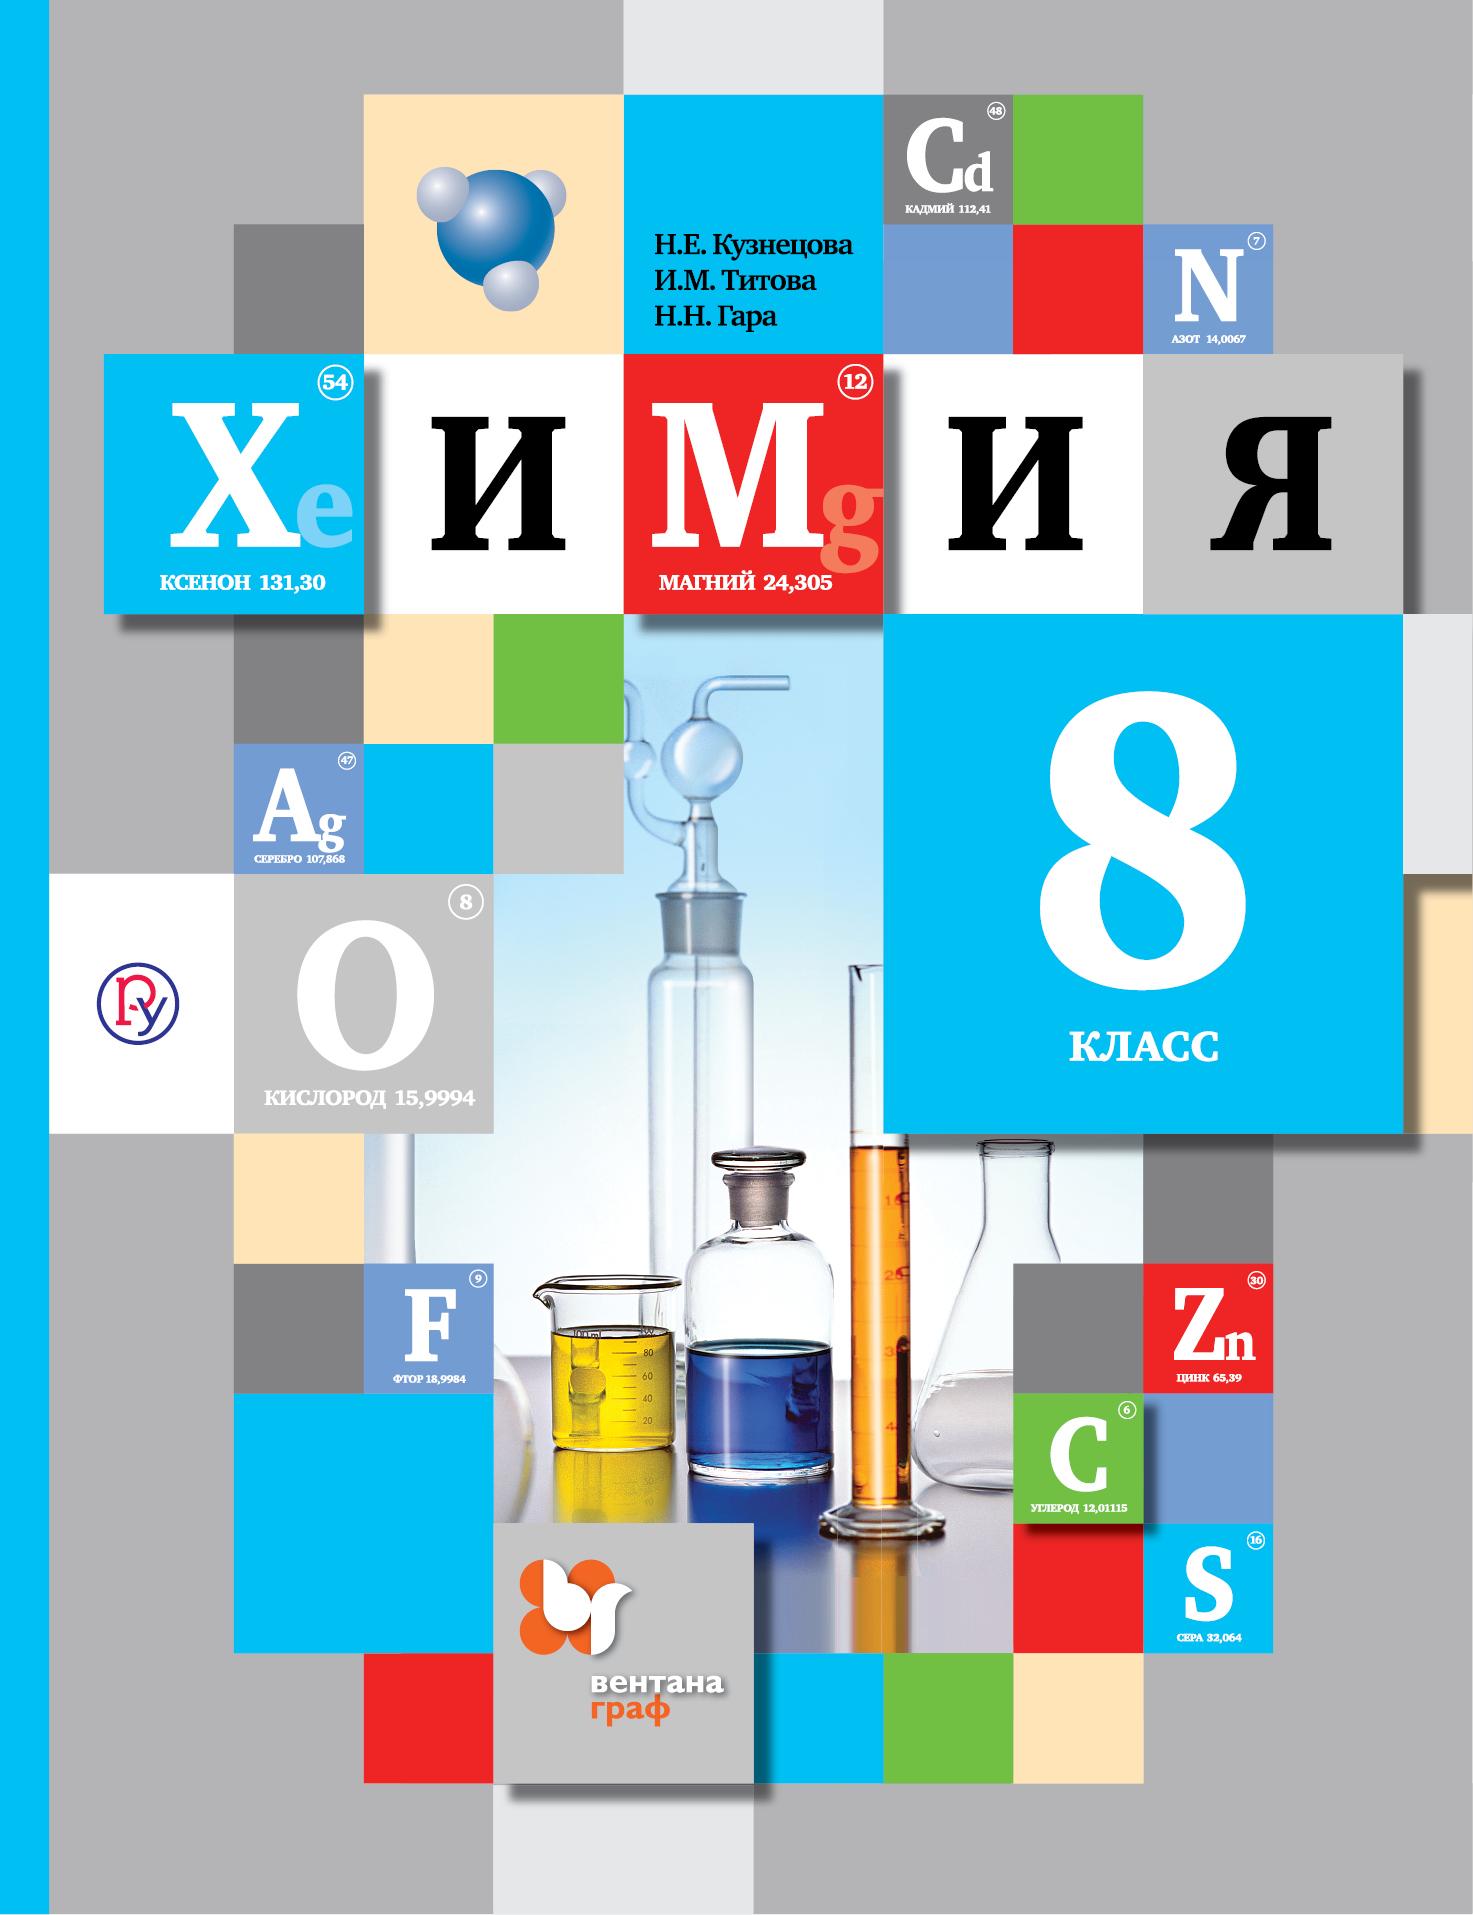 Кузнецова Н.Е., Гара Н.Н. Химия. 8 класс. Учебник.